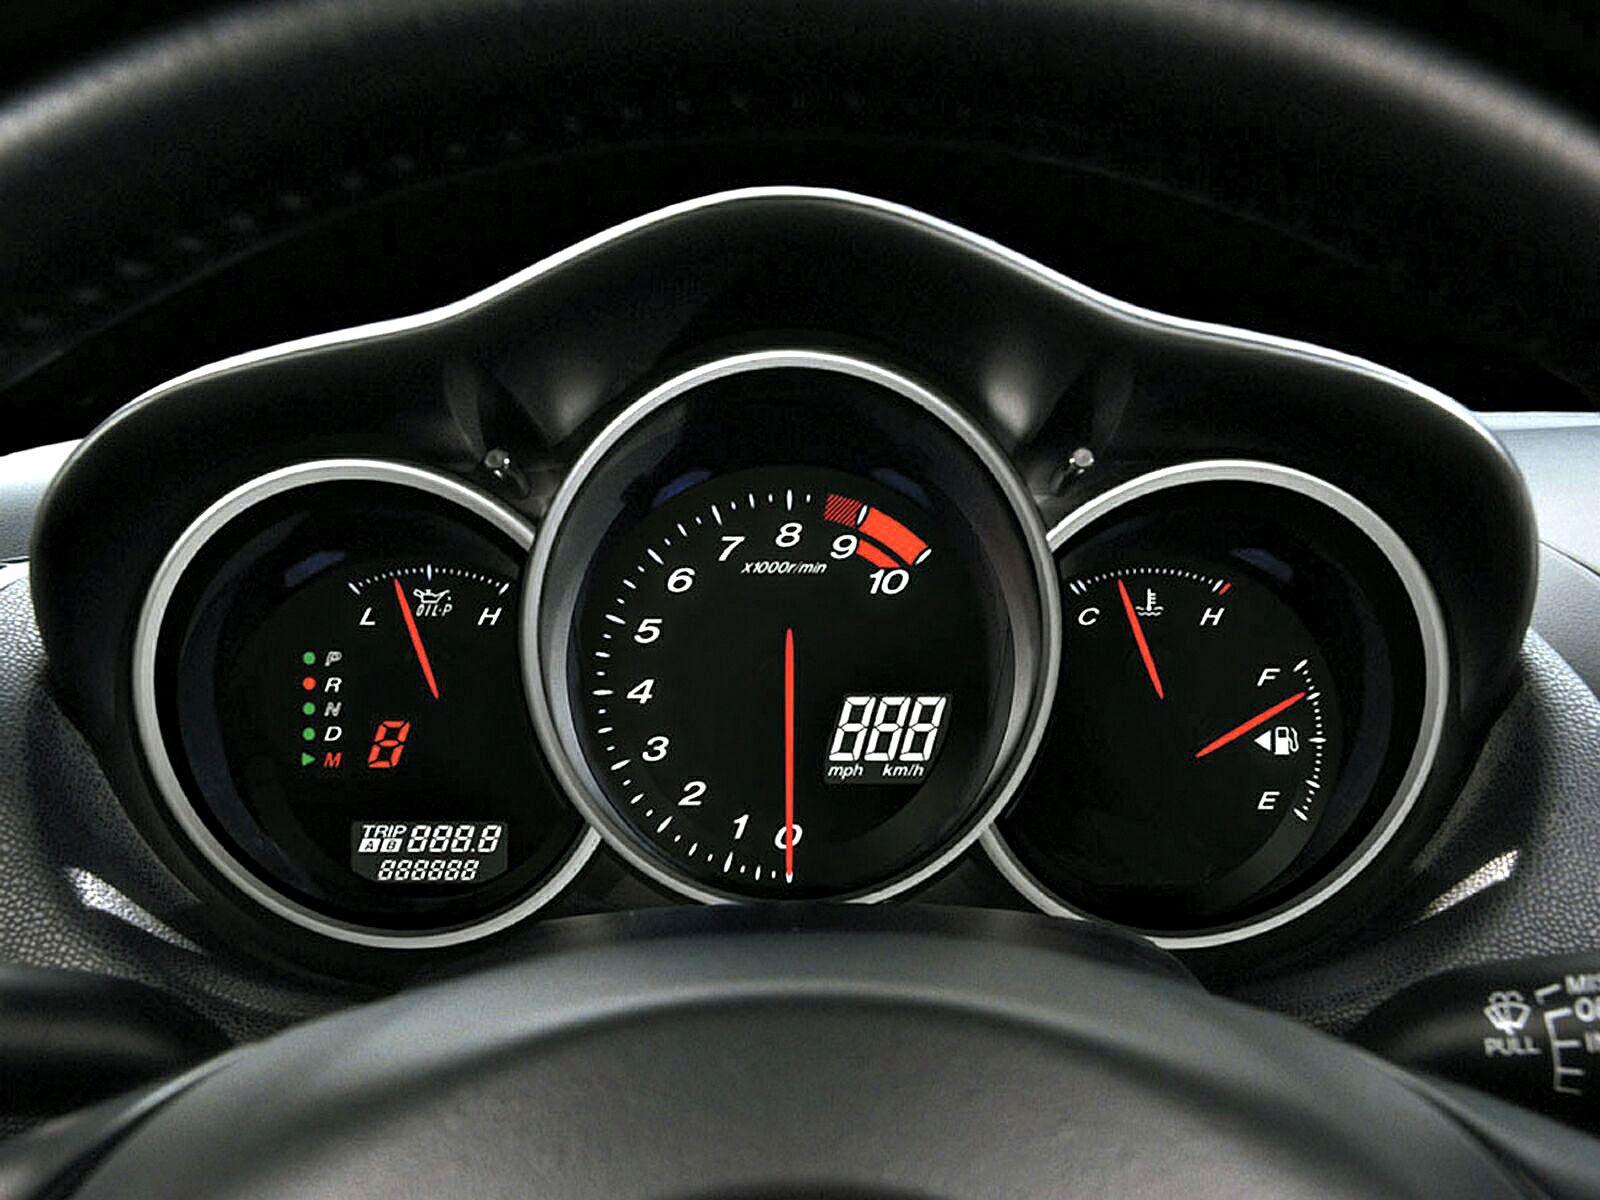 Mazda Rx8 Gauges Wallpaper 1600x1200